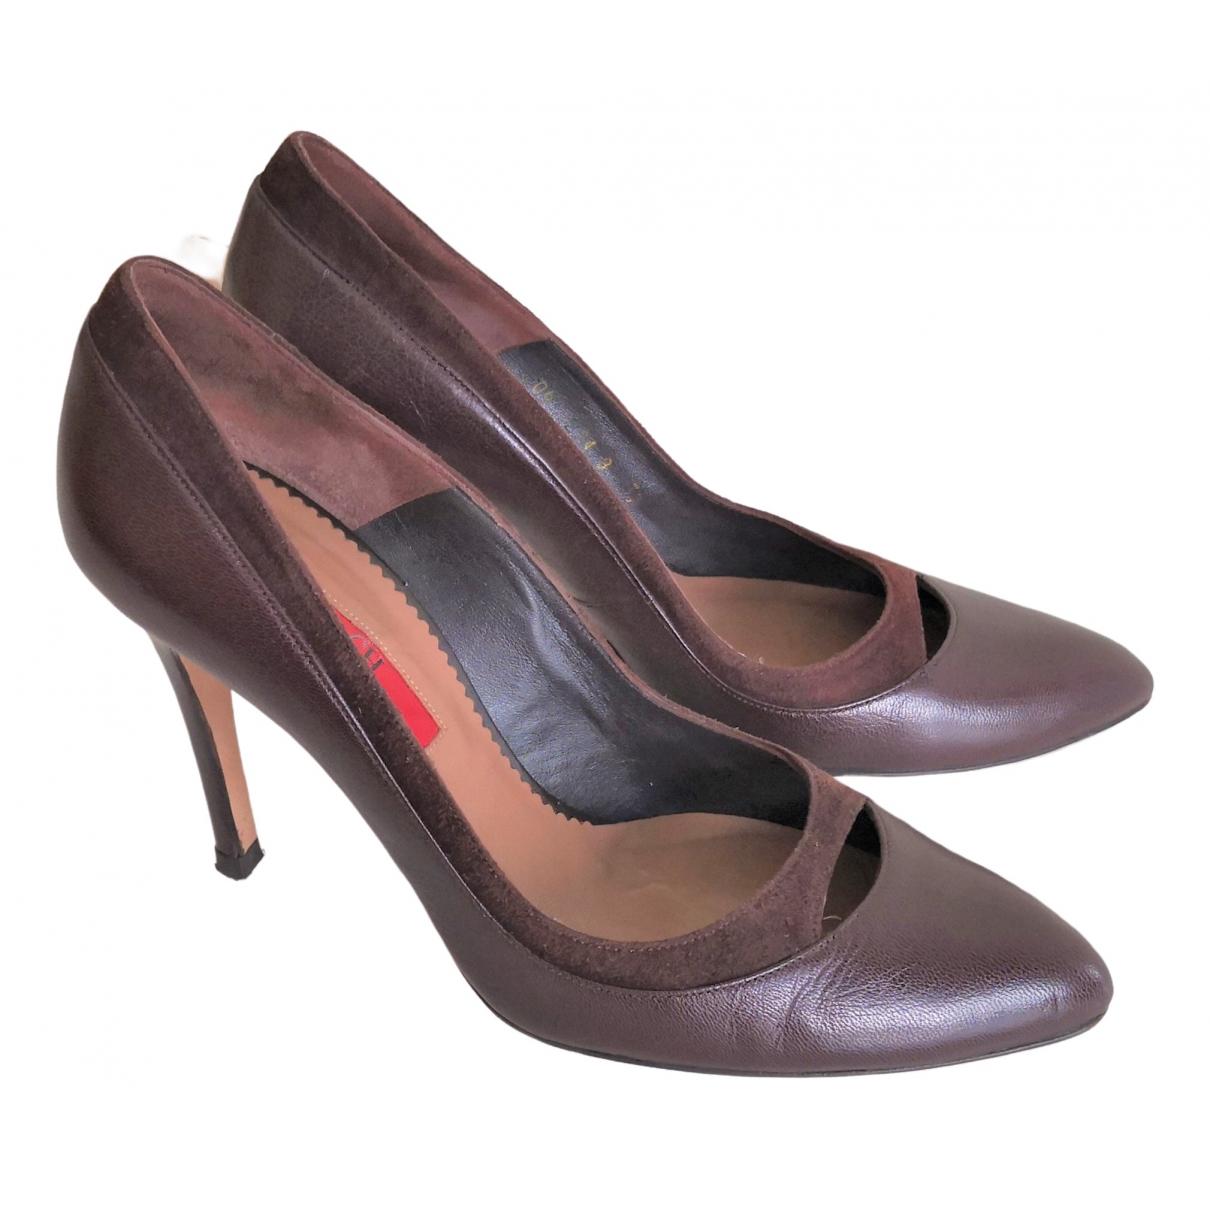 Carolina Herrera - Escarpins   pour femme en cuir - marron